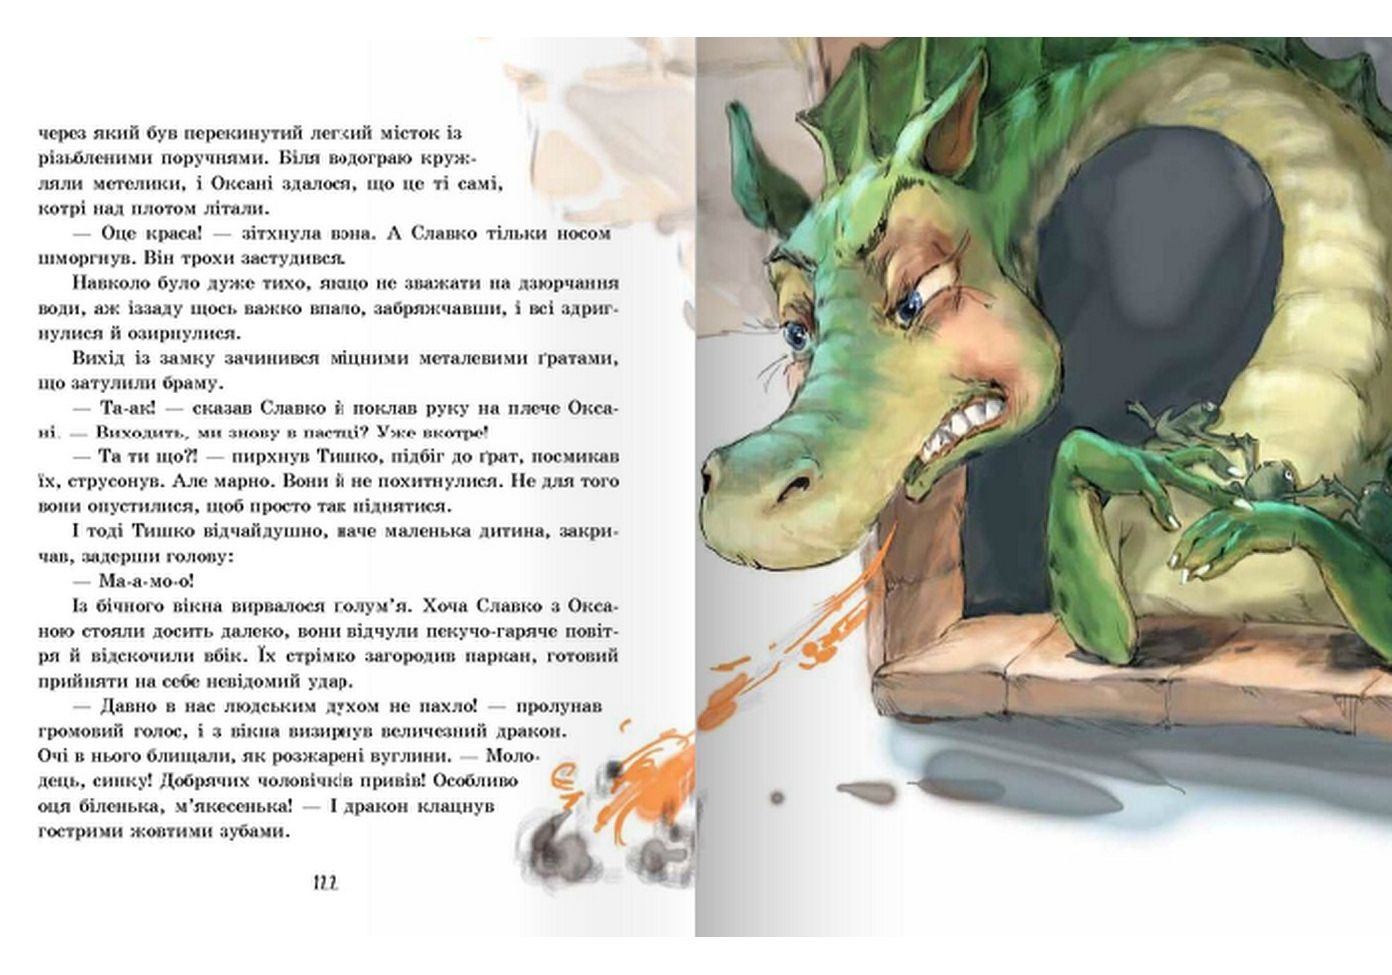 https://i4.imageban.ru/out/2020/07/02/8ae5731ad04326f3d7920dd6b05d6468.jpg